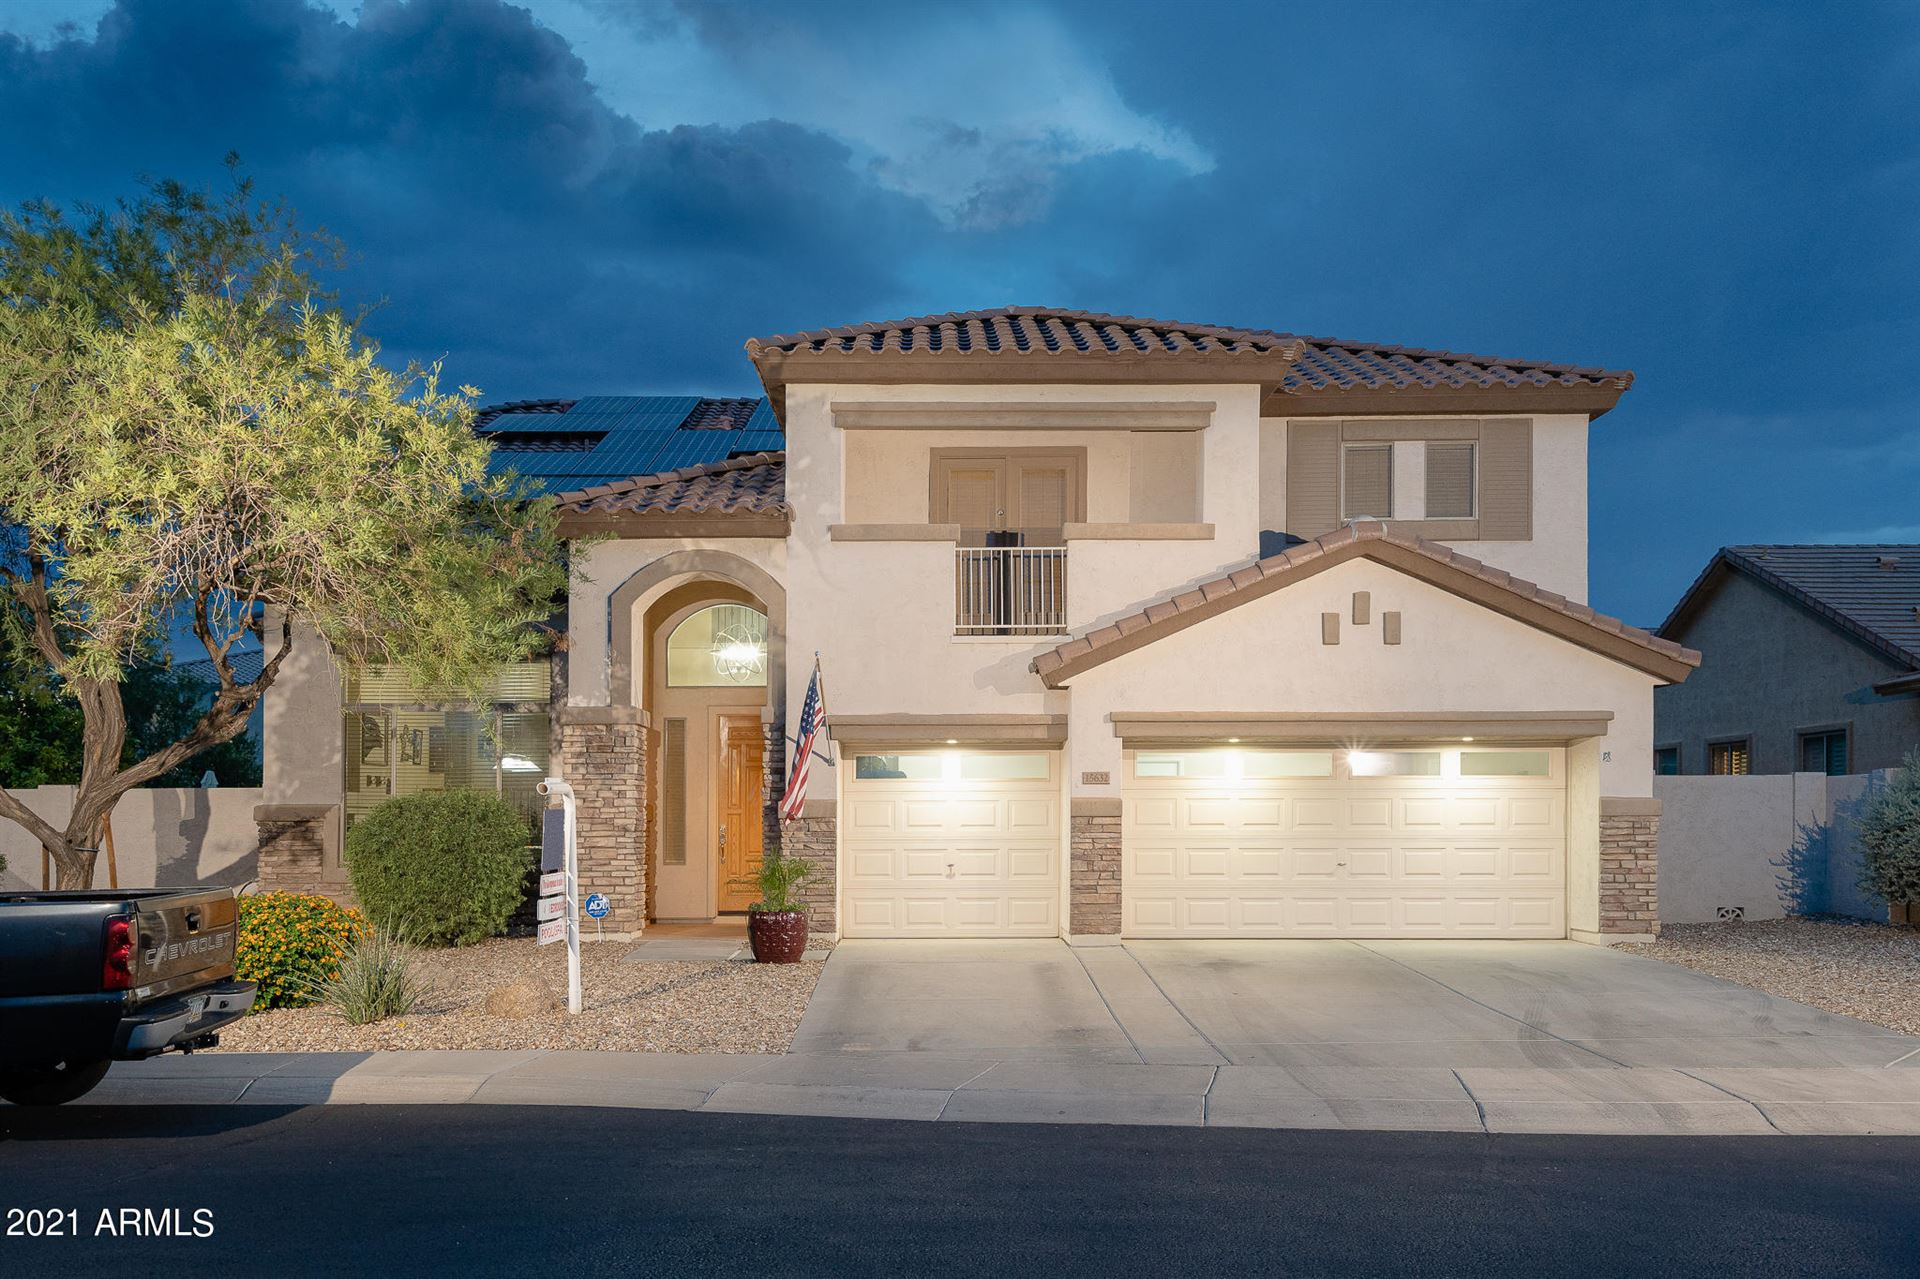 Photo of 15632 N 176TH Drive, Surprise, AZ 85388 (MLS # 6268603)